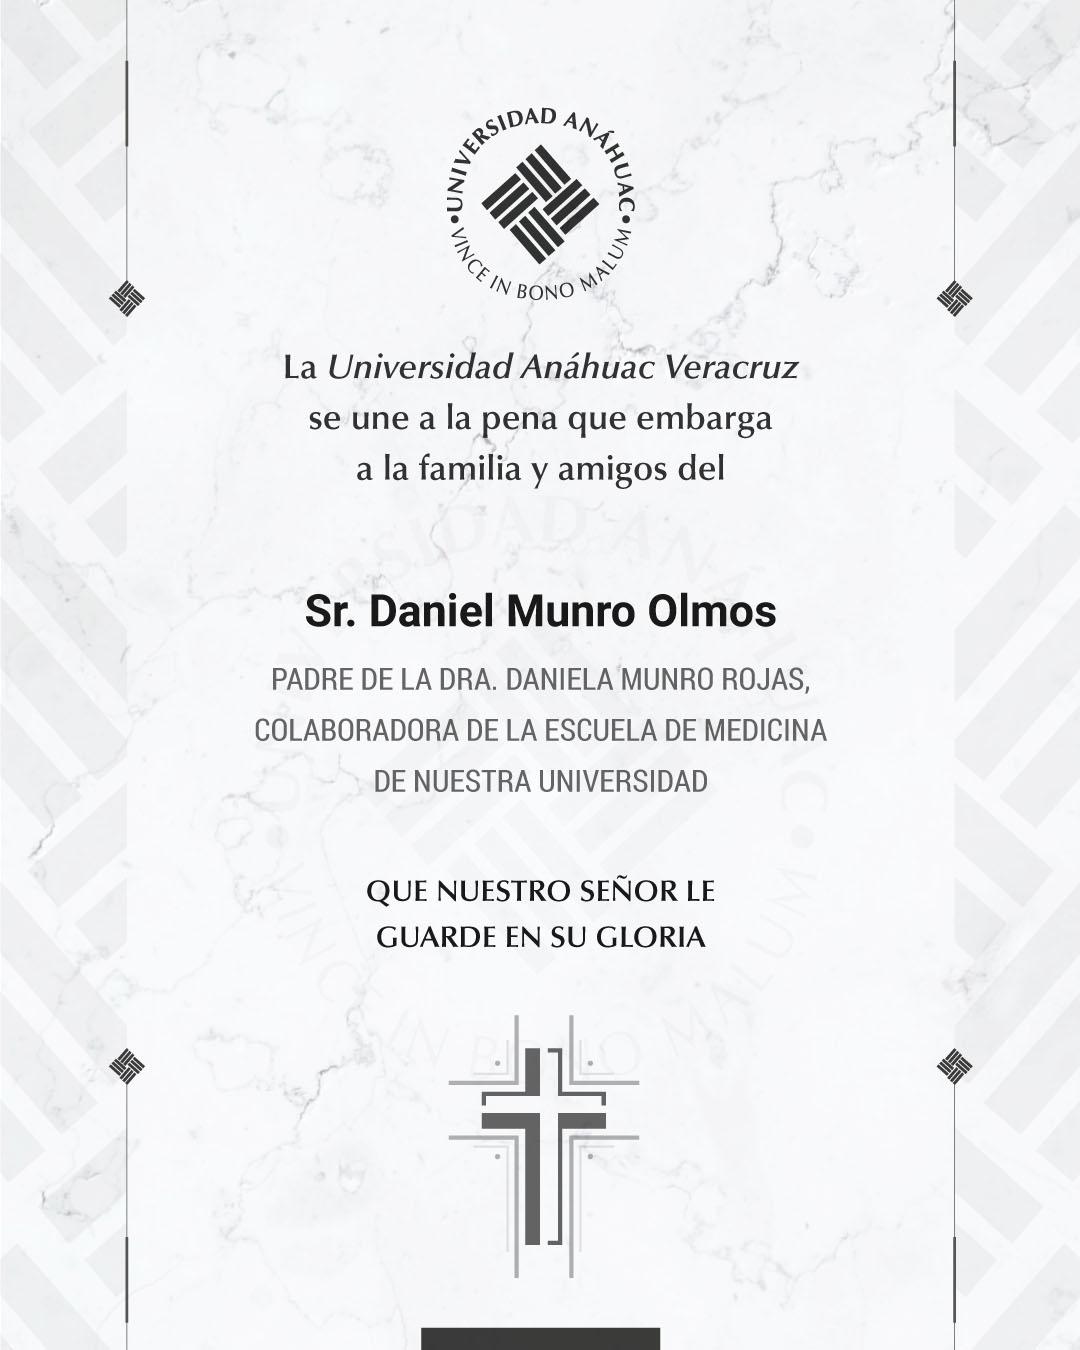 Sr. Daniel Munro Olmos